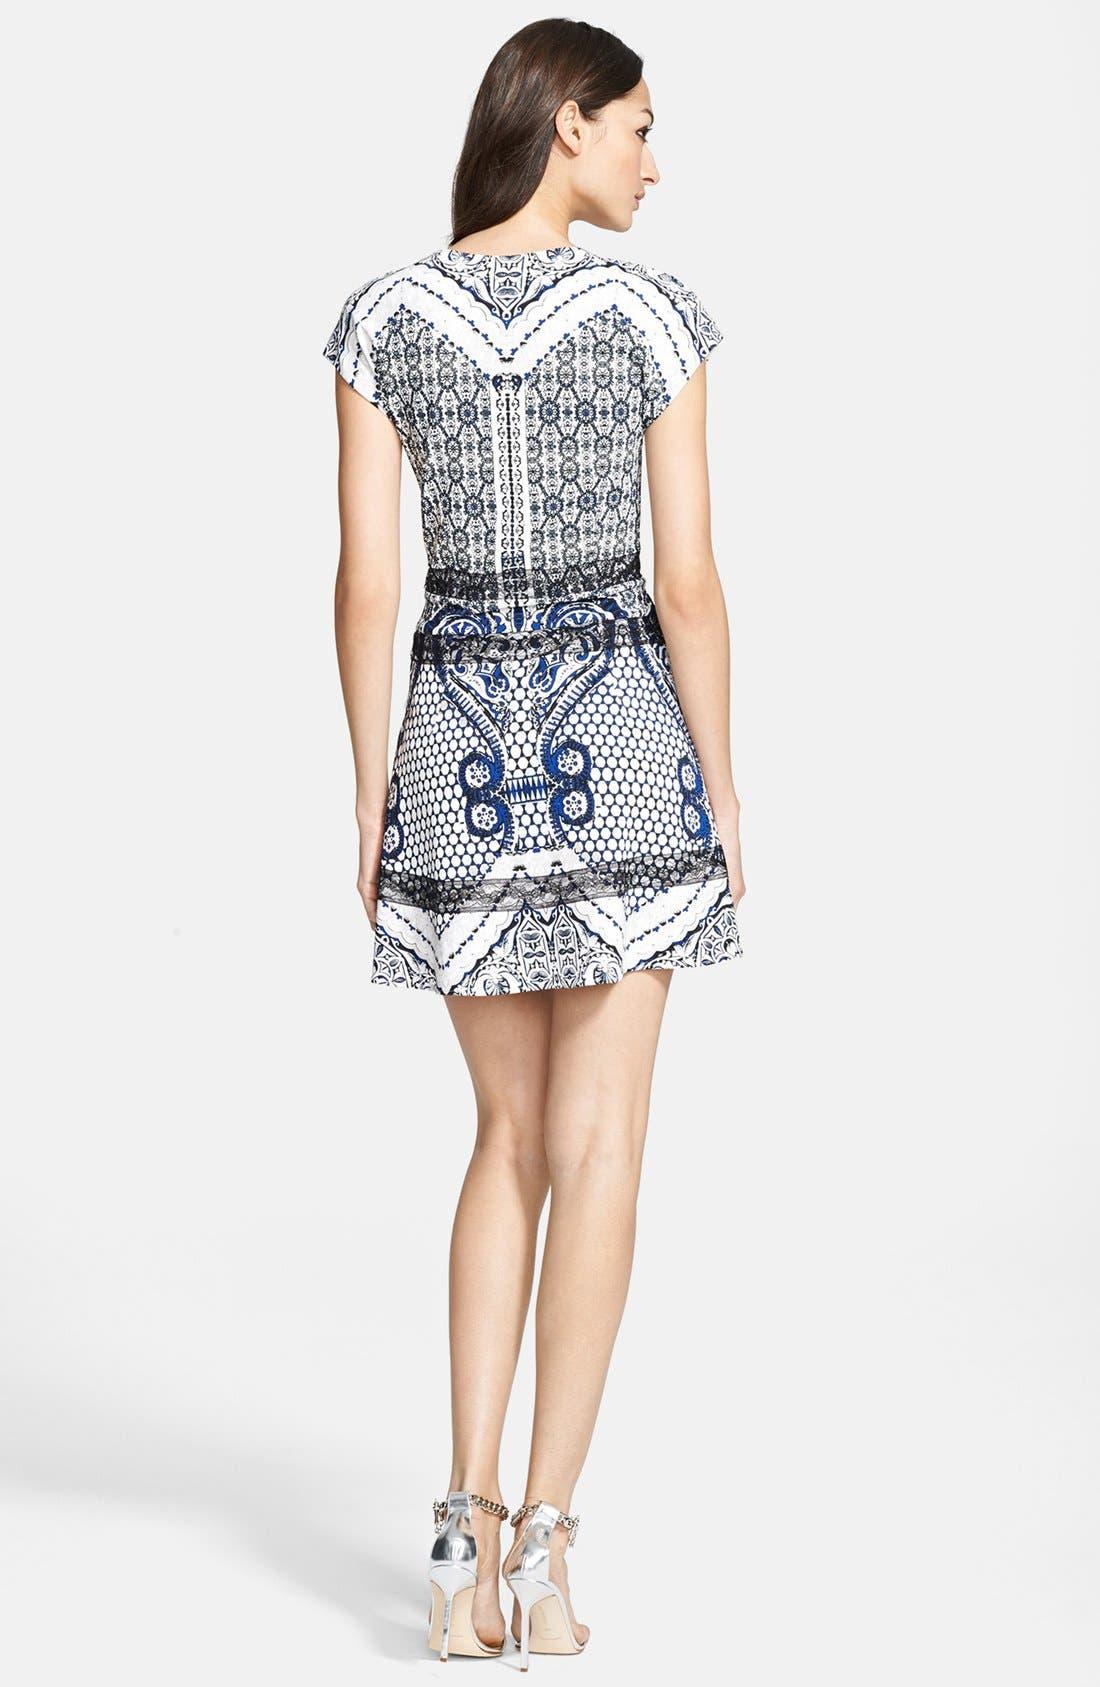 ROBERTO CAVALLI, Print Fit & Flare Dress, Alternate thumbnail 3, color, 400